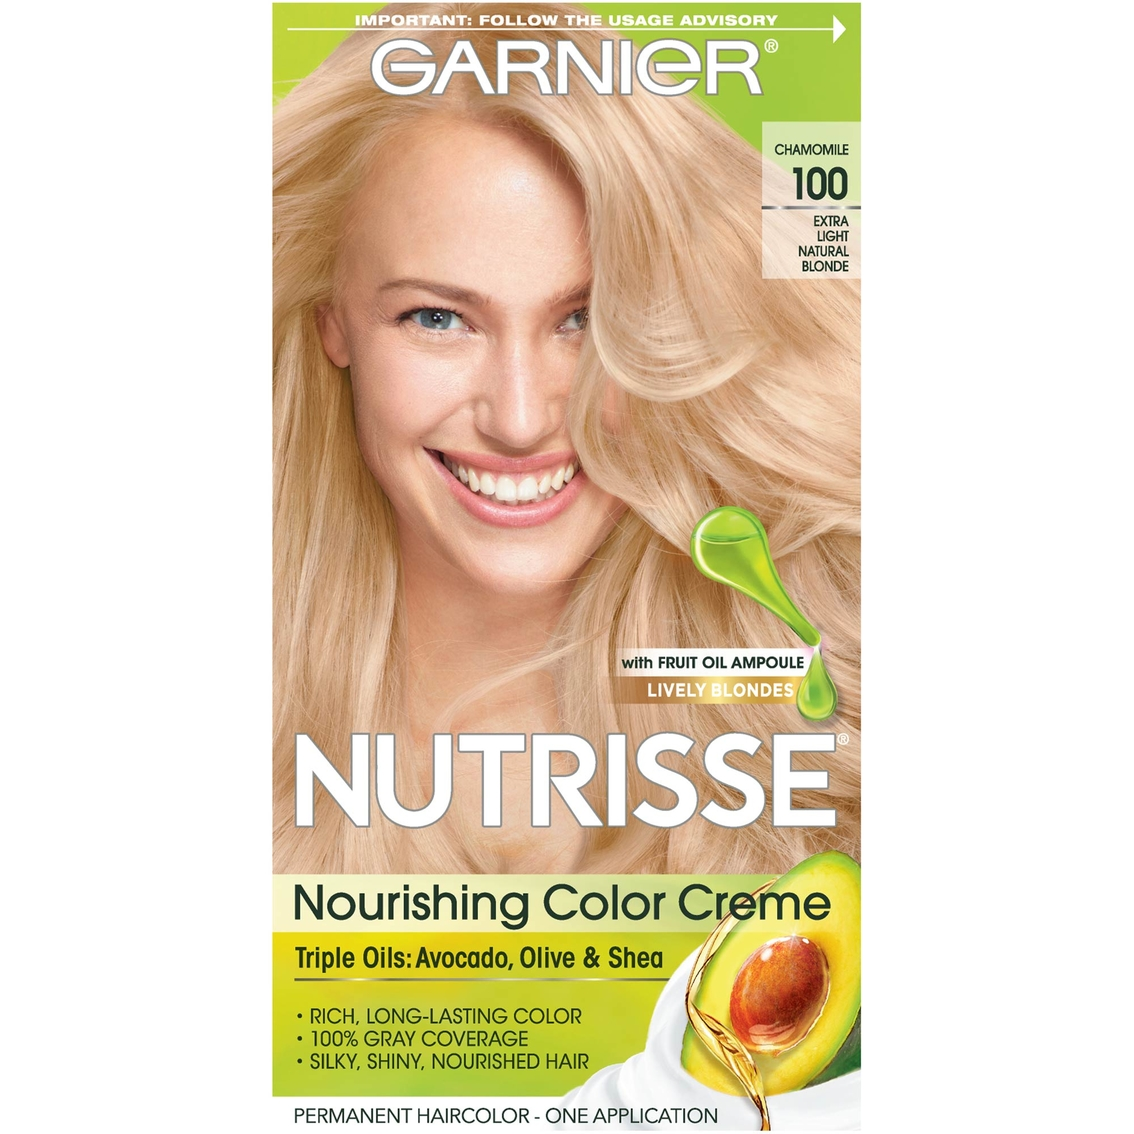 Garnier Nutrisse Nourishing Hair Color Creme Hair Treatments